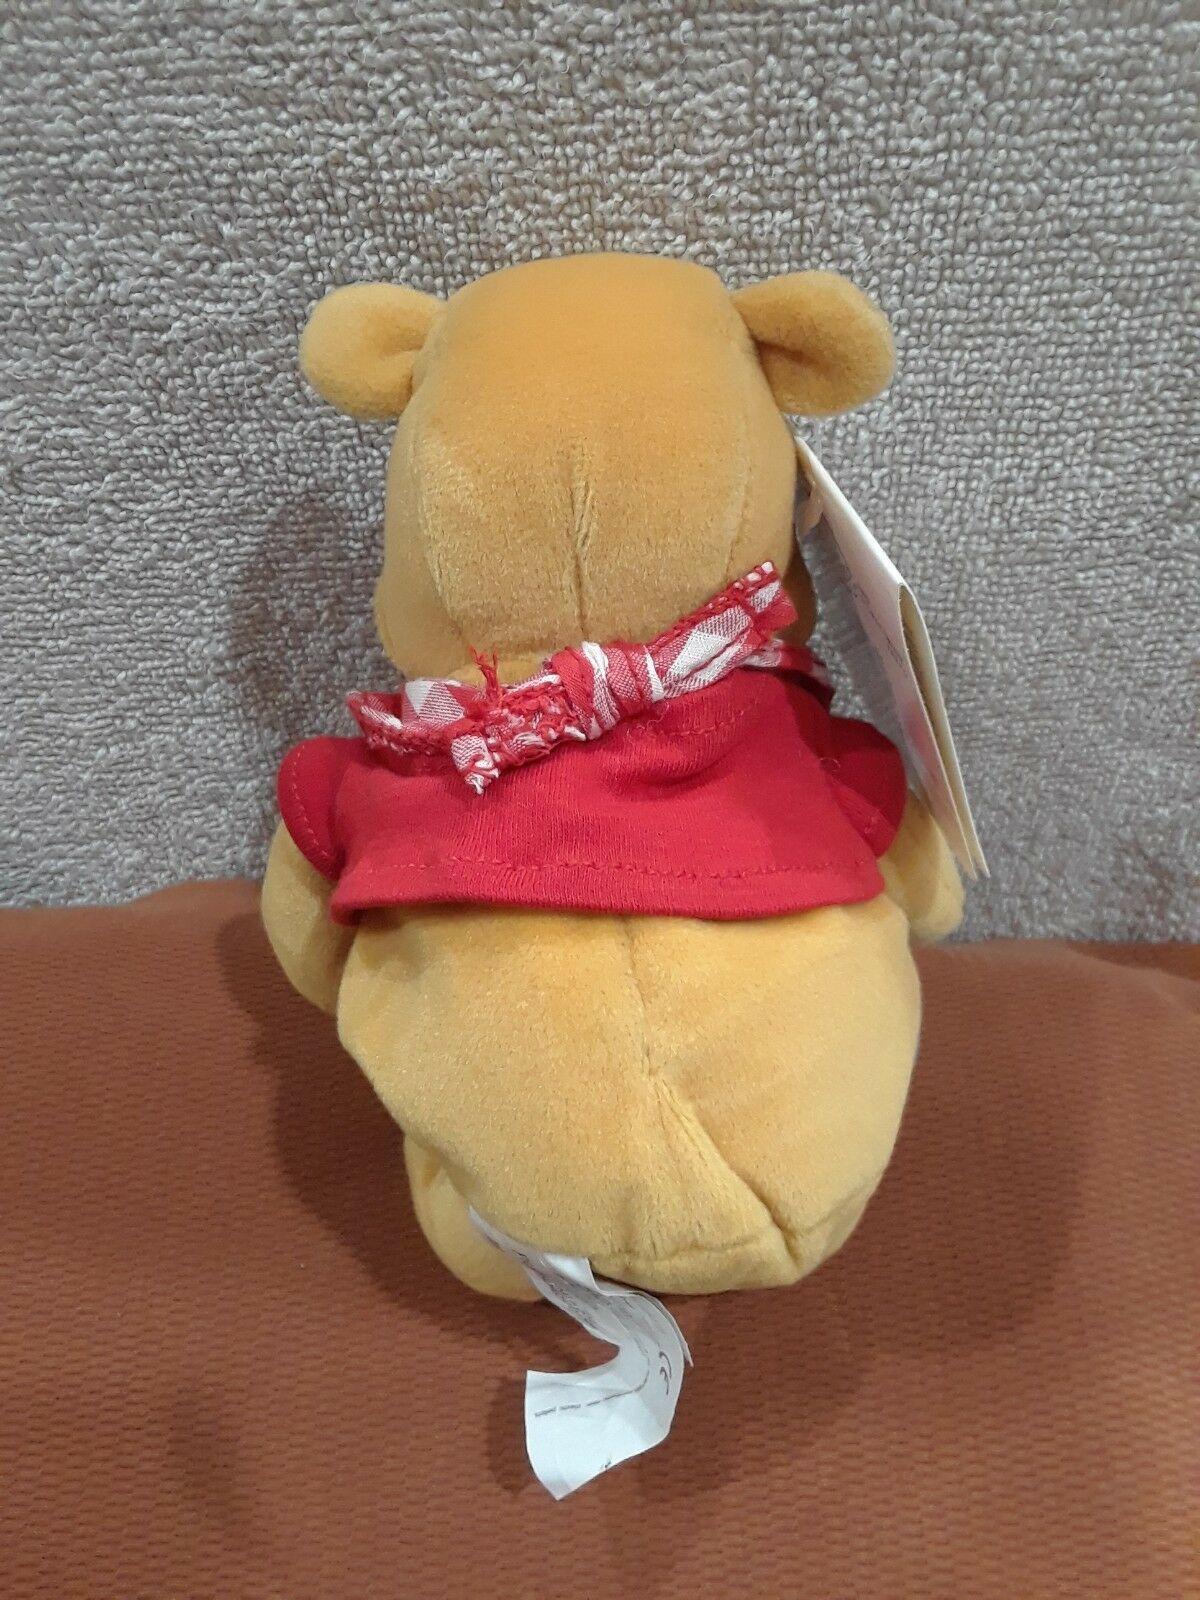 Toys & Hobbies Beanbag Plush Dependable Disney Store 8 Inch Plush Stuffed Nwt Bean Bag Snow White Prince Witch